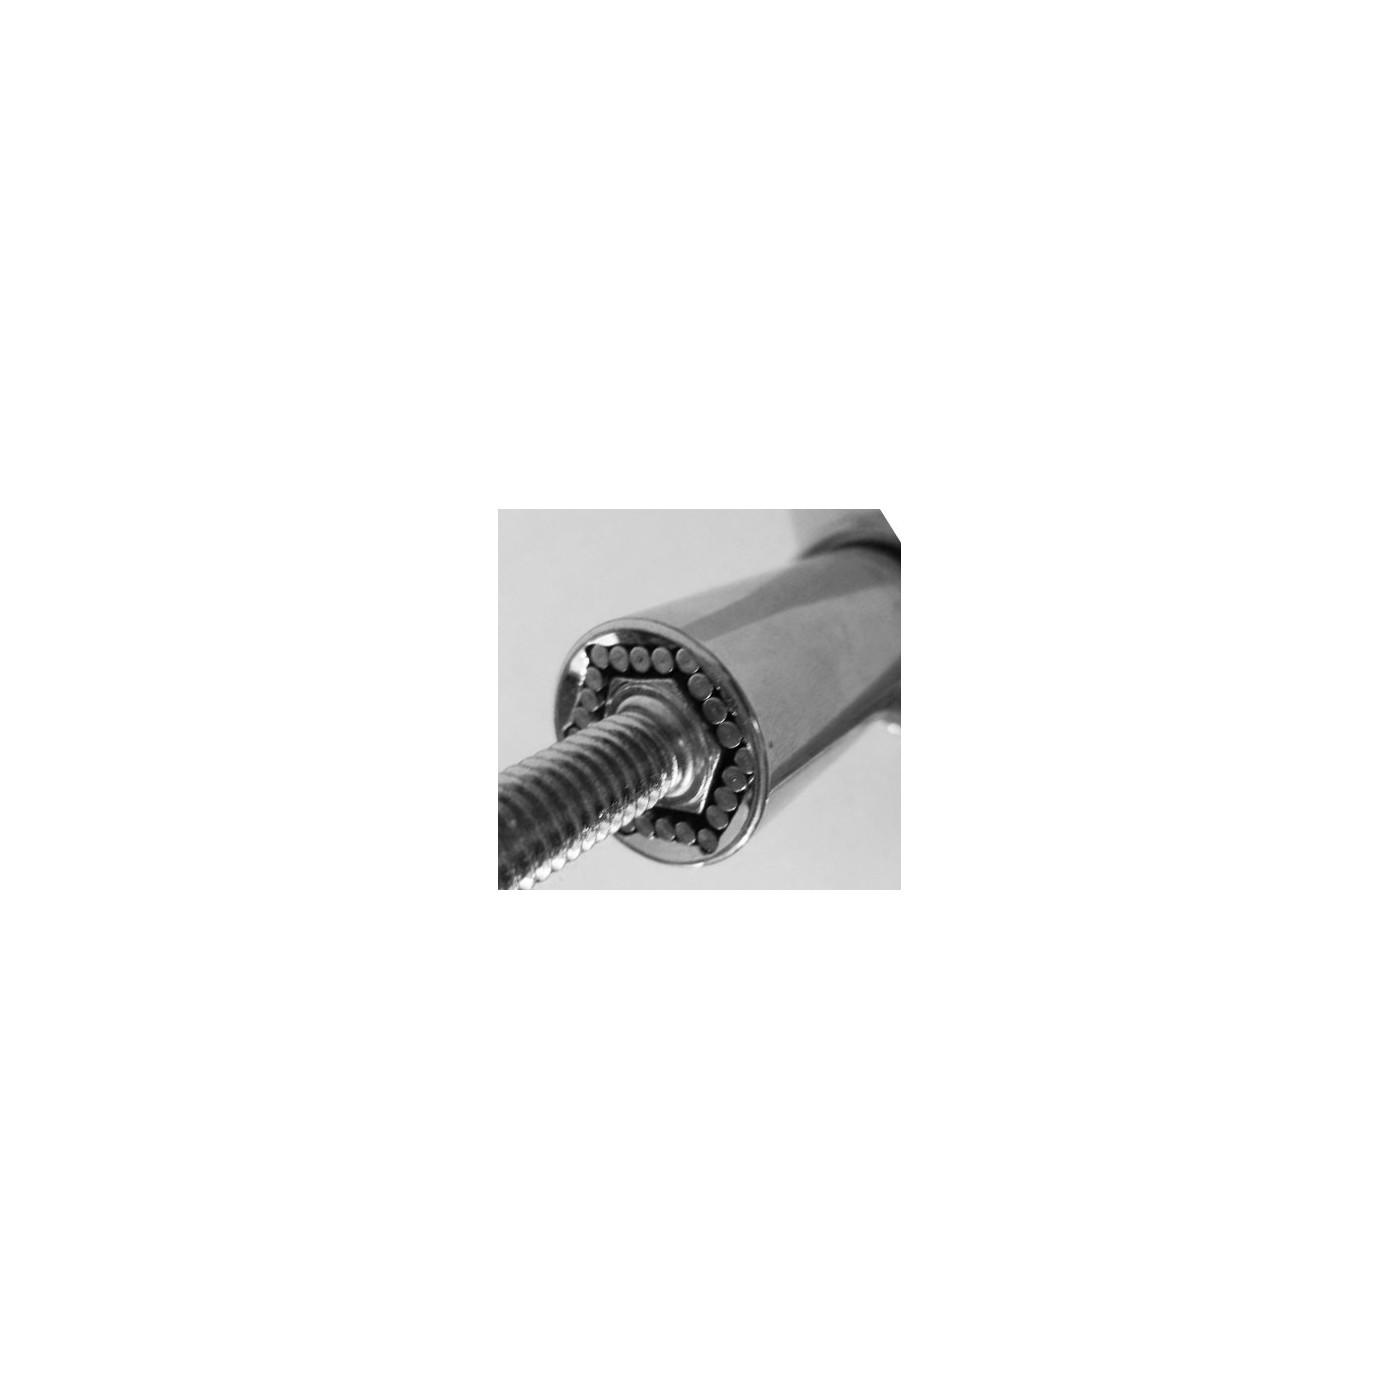 Manico Gator MEDIUM, chiave a bussola universale 9-27 mm  - 1